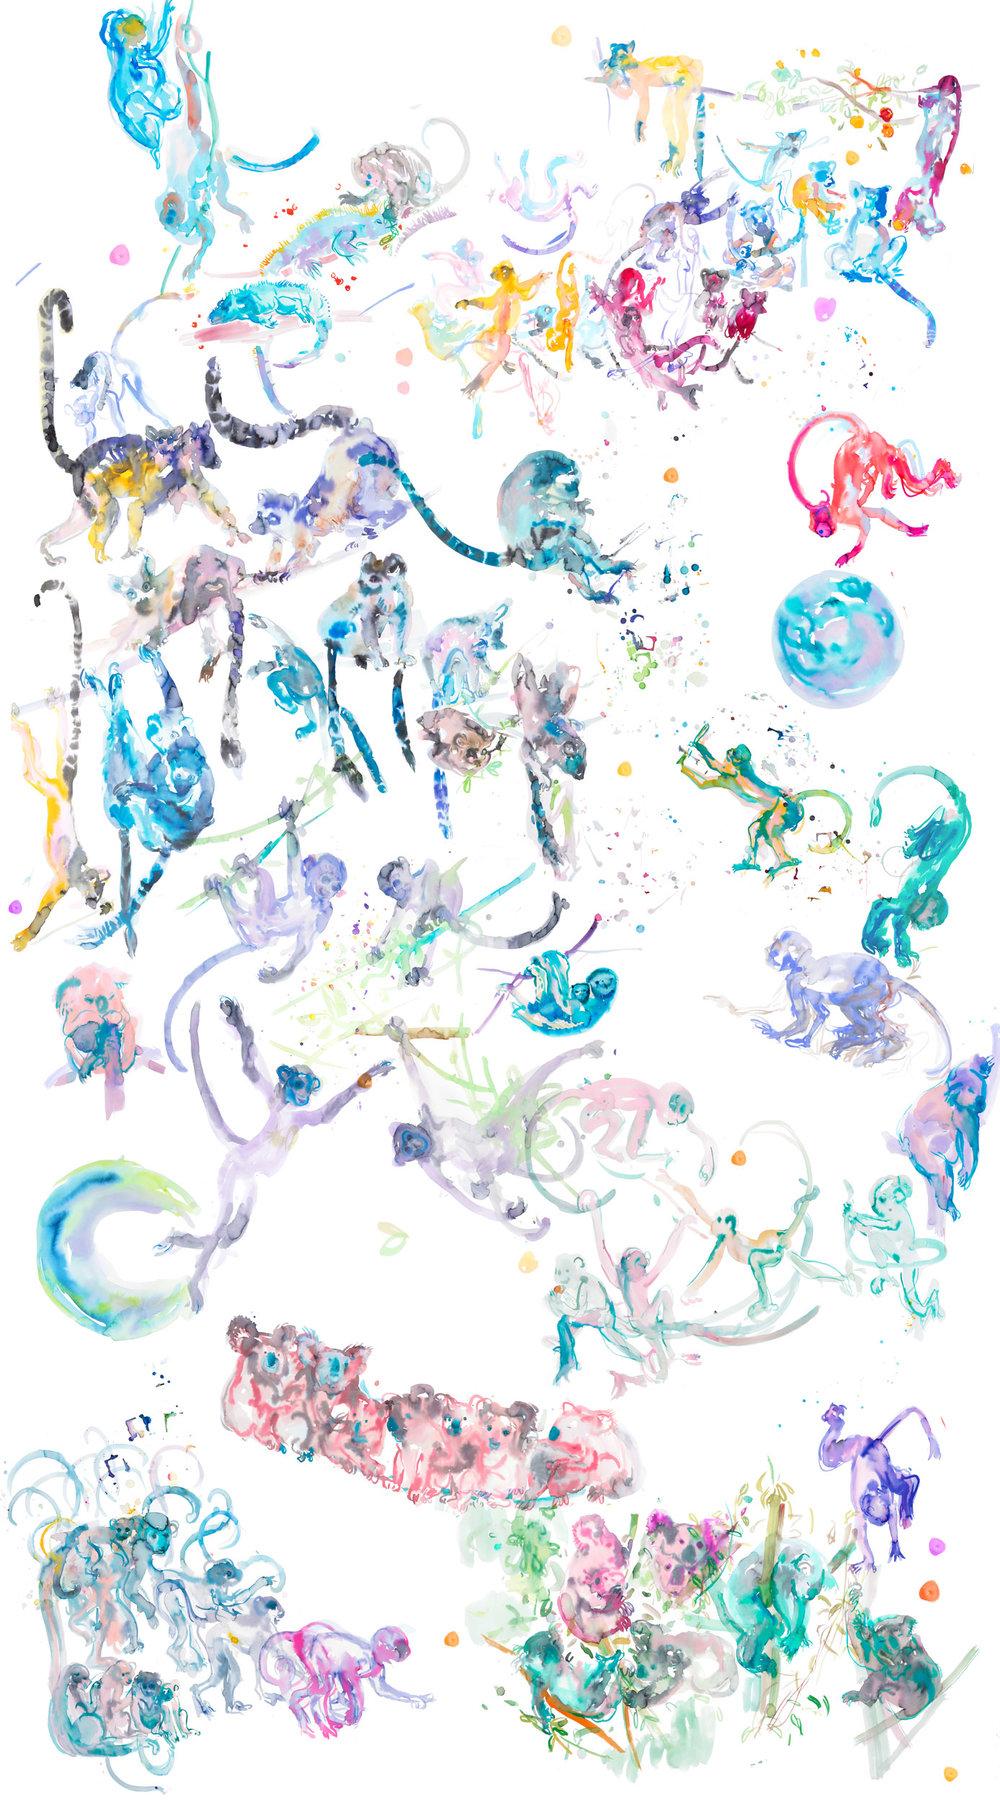 JungleMural - ARTWORK DETAILS:ARTWORK DETAILS:Fine Art print of original watercolor painting.Limited editionWidth: 111 cm (approx 44